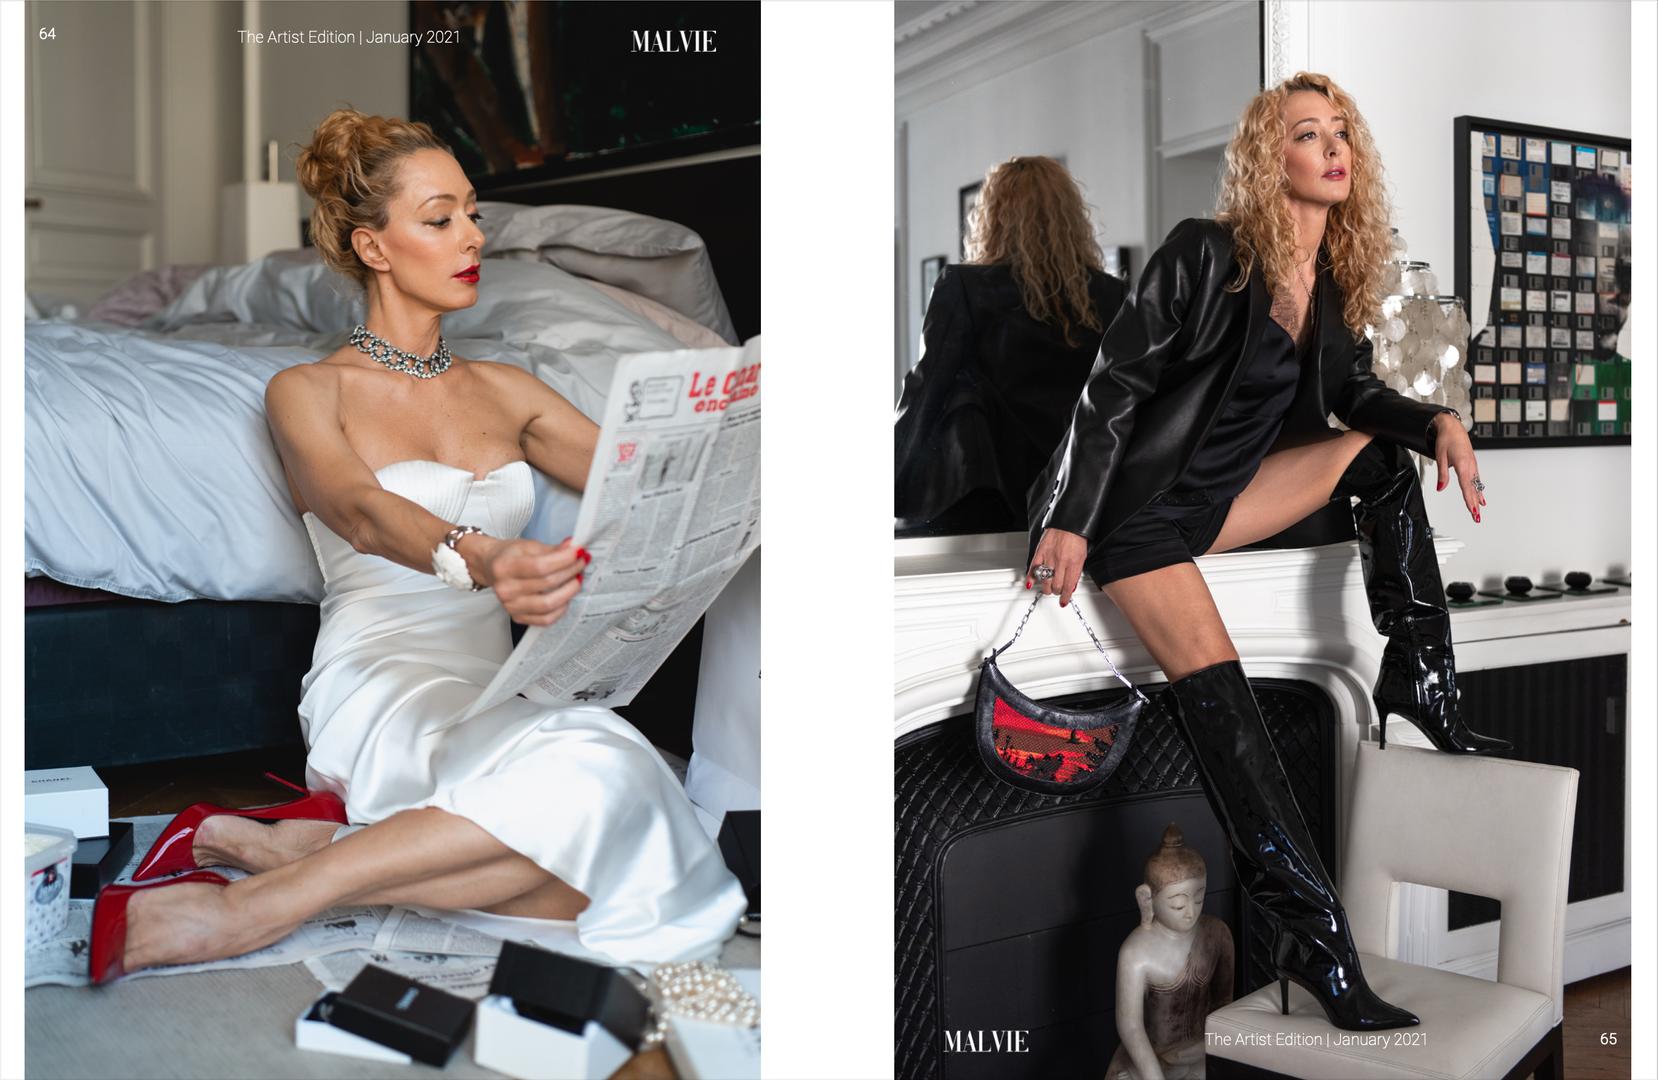 MALVIE Magazine January 2021